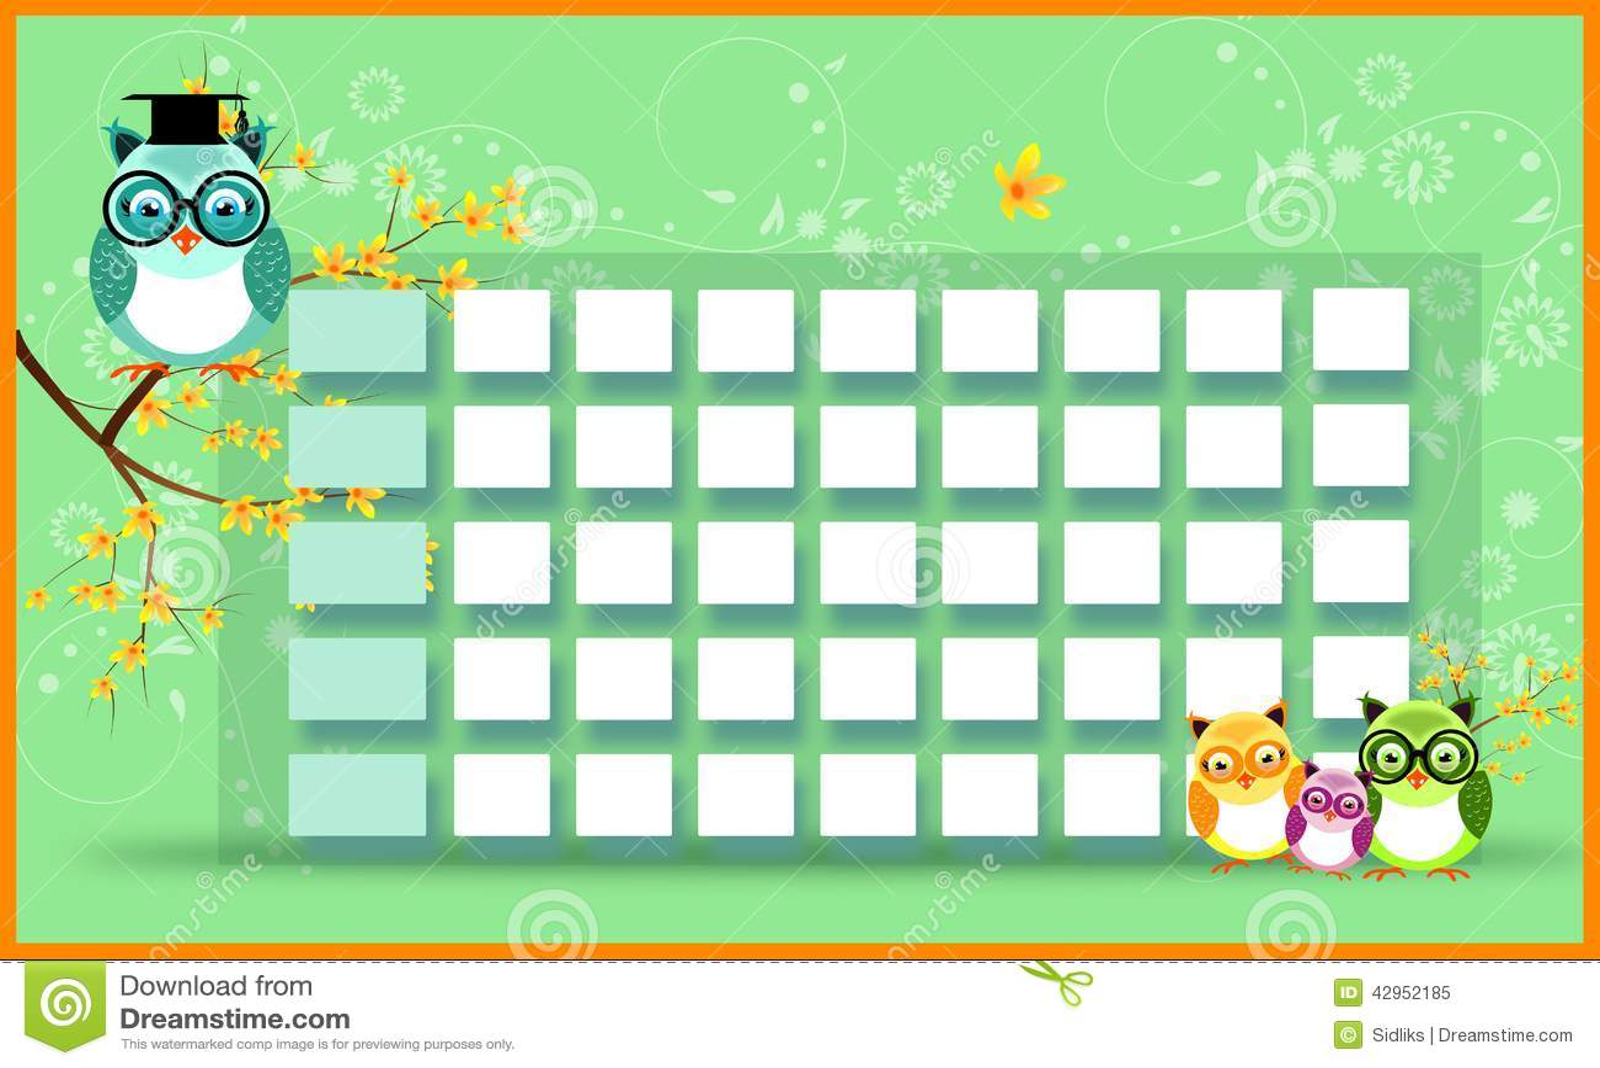 design schedule template